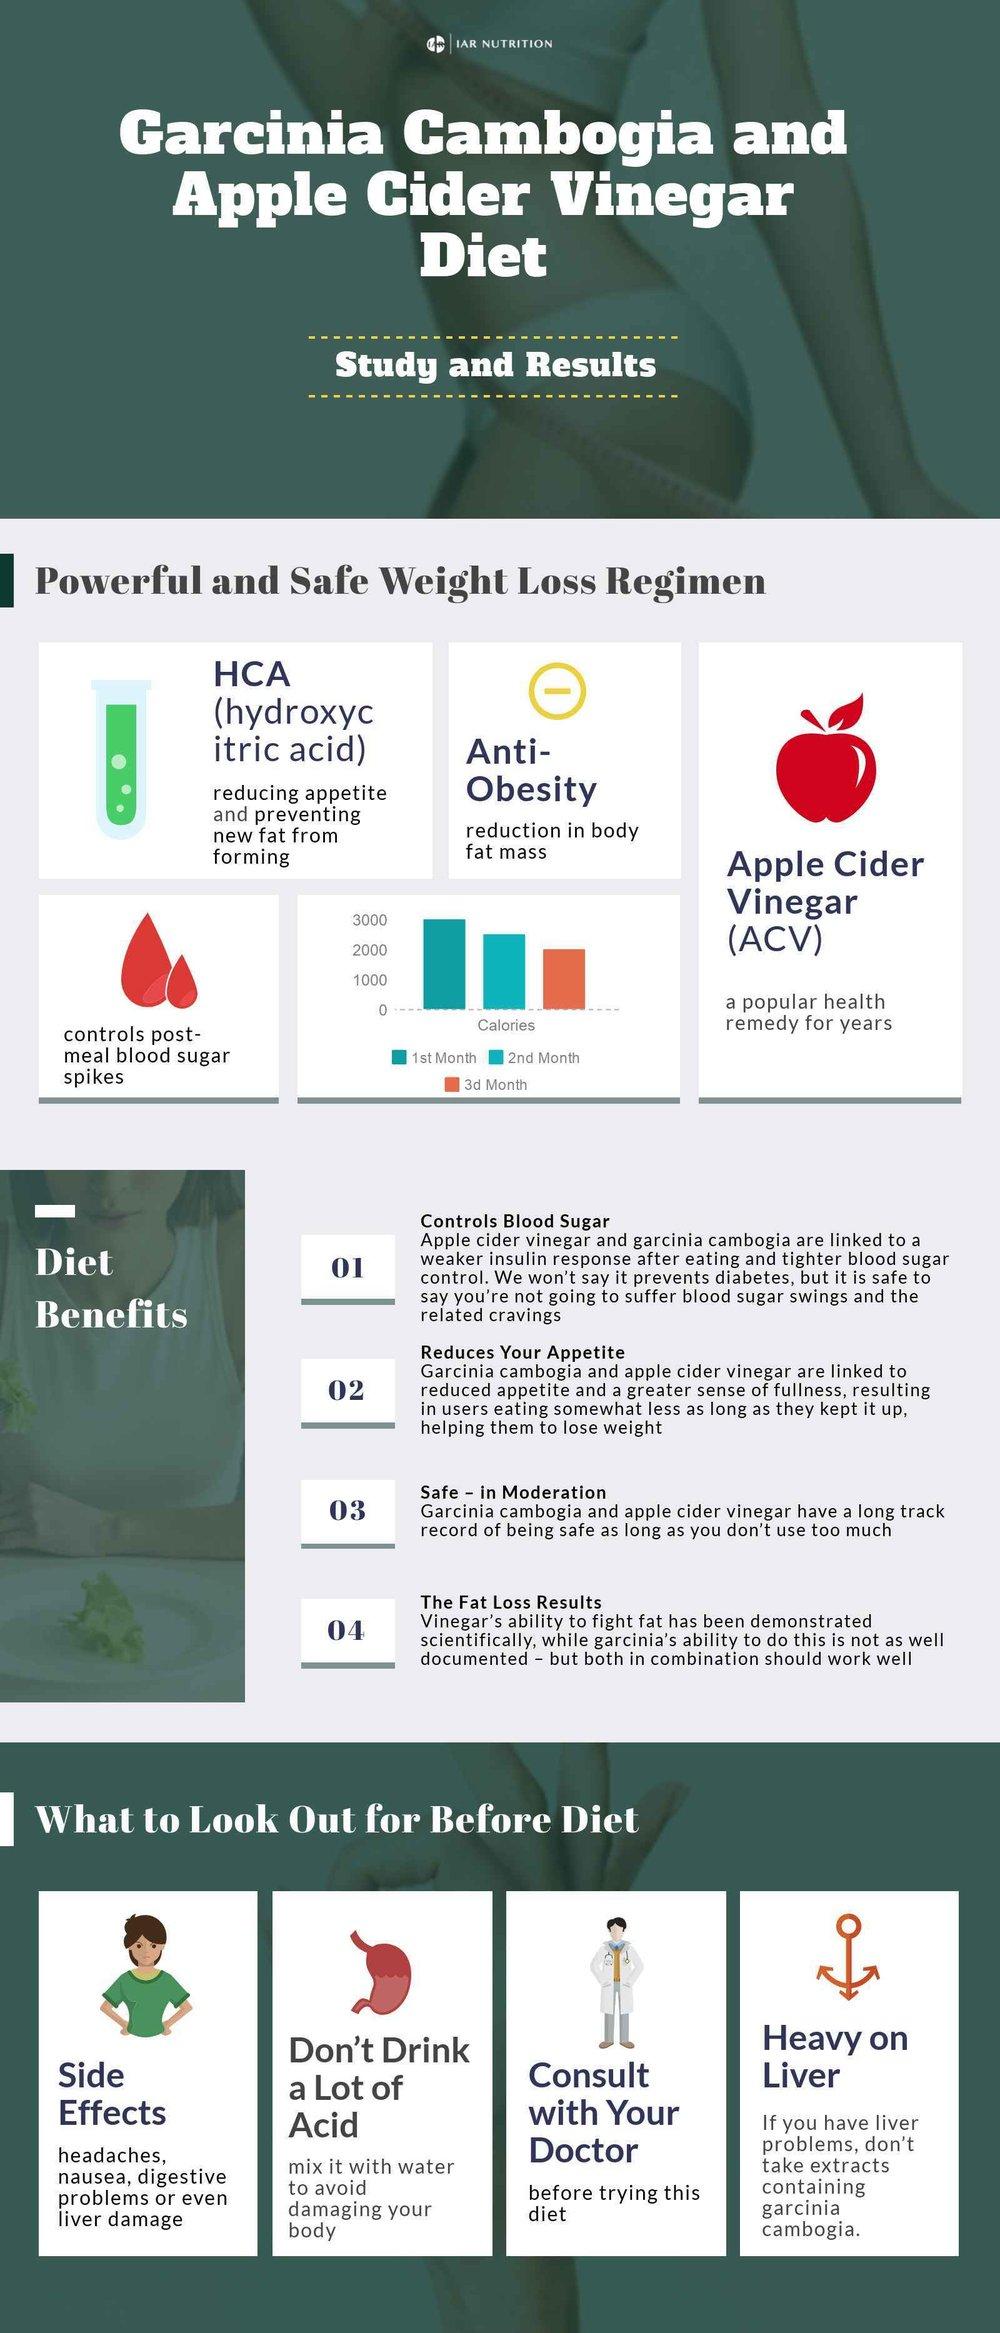 garcinia-cambogia-and-apple-cider-vinegar-diet.jpg